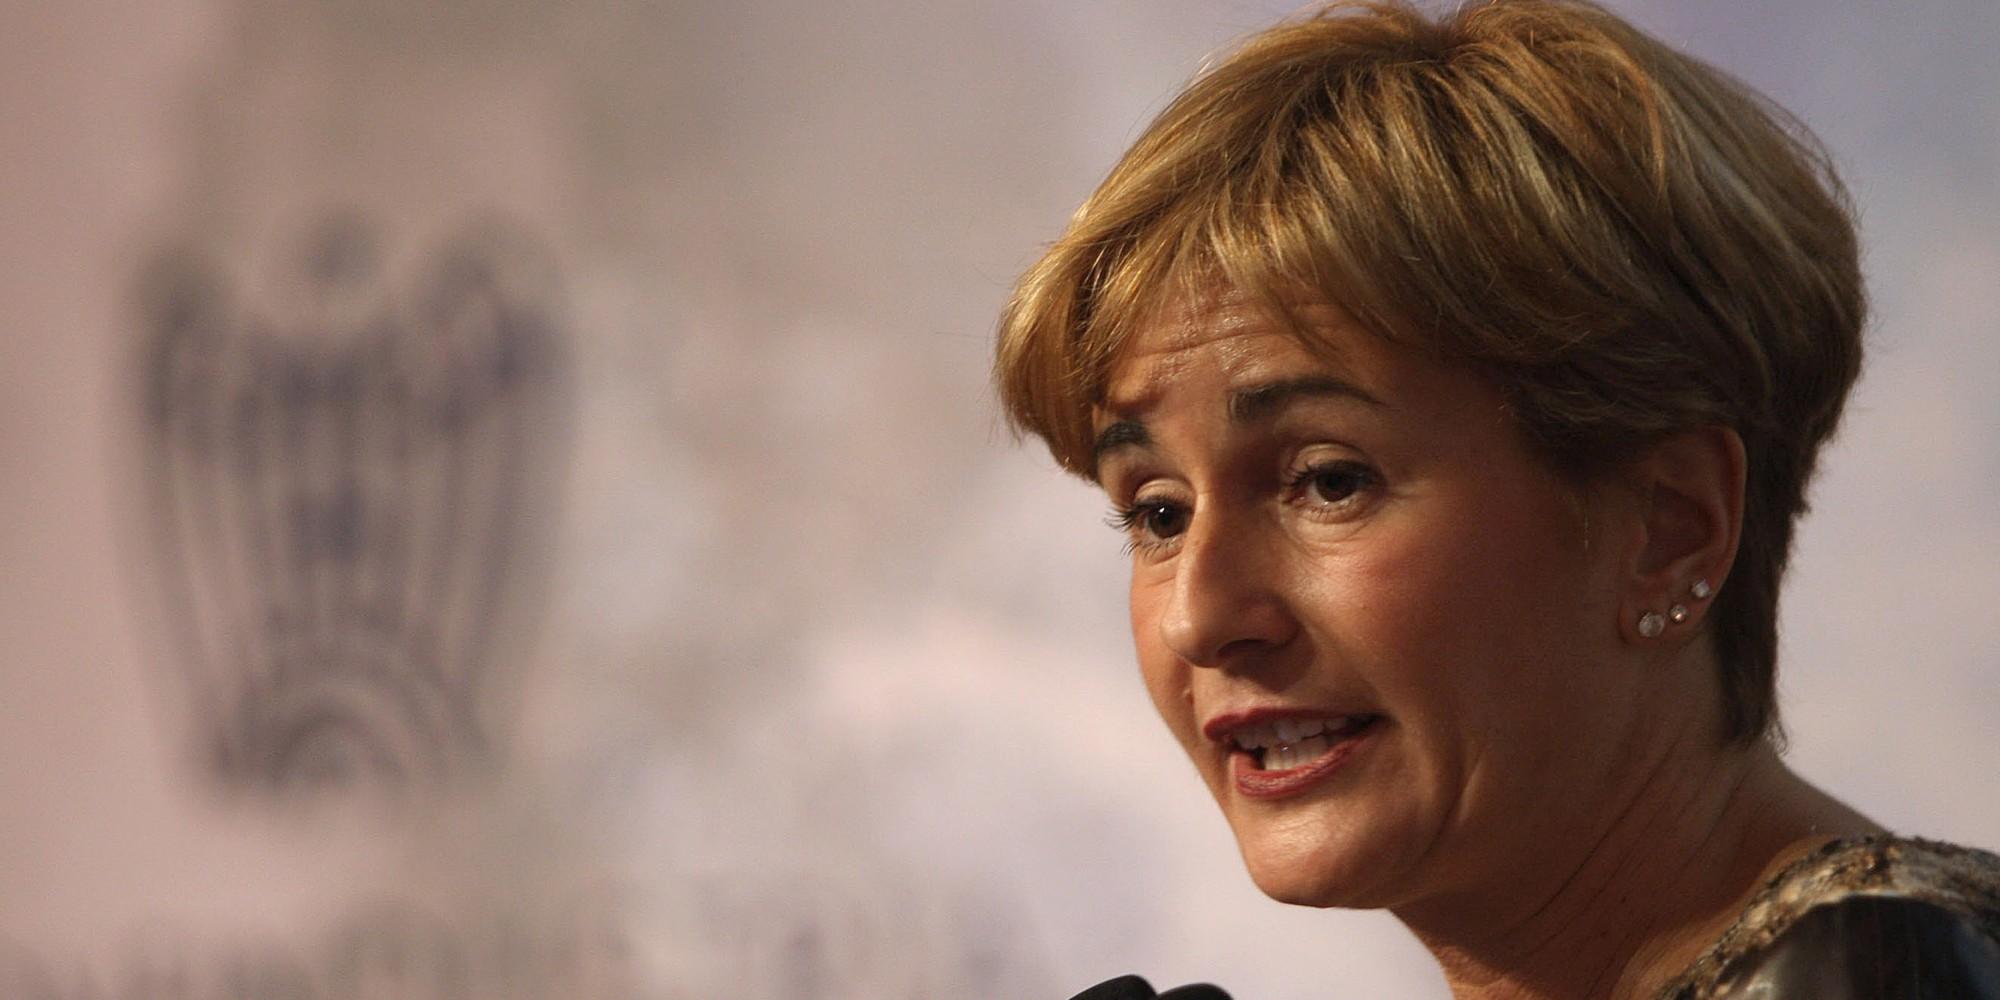 dimissioni ministro guidi, referendum trivelle, teresa bellanova ministro